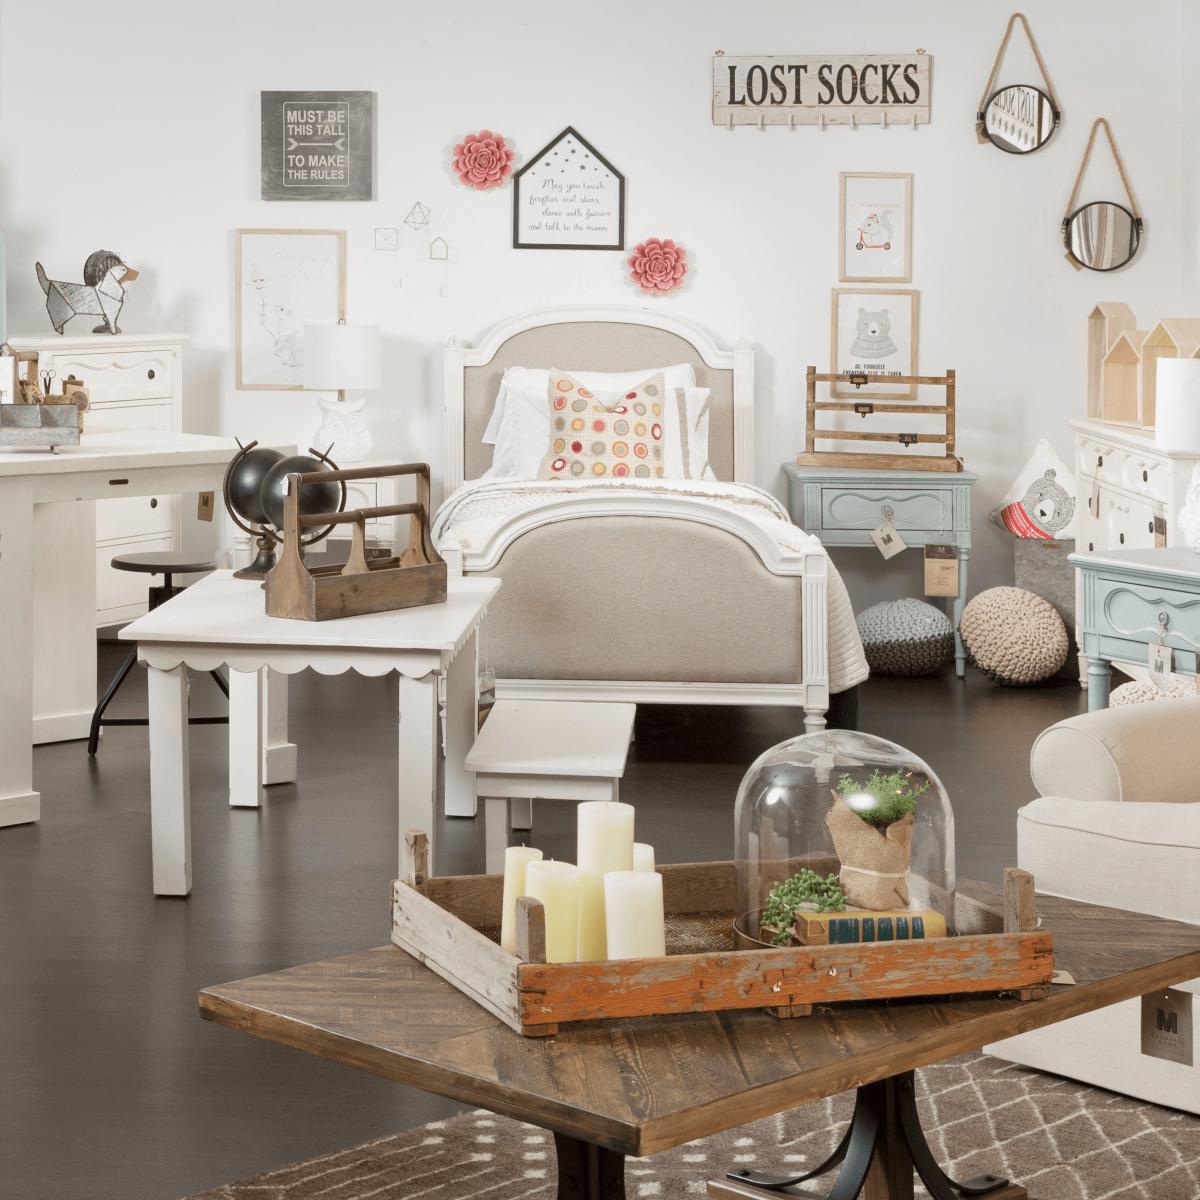 Magnolia Home furniture collection